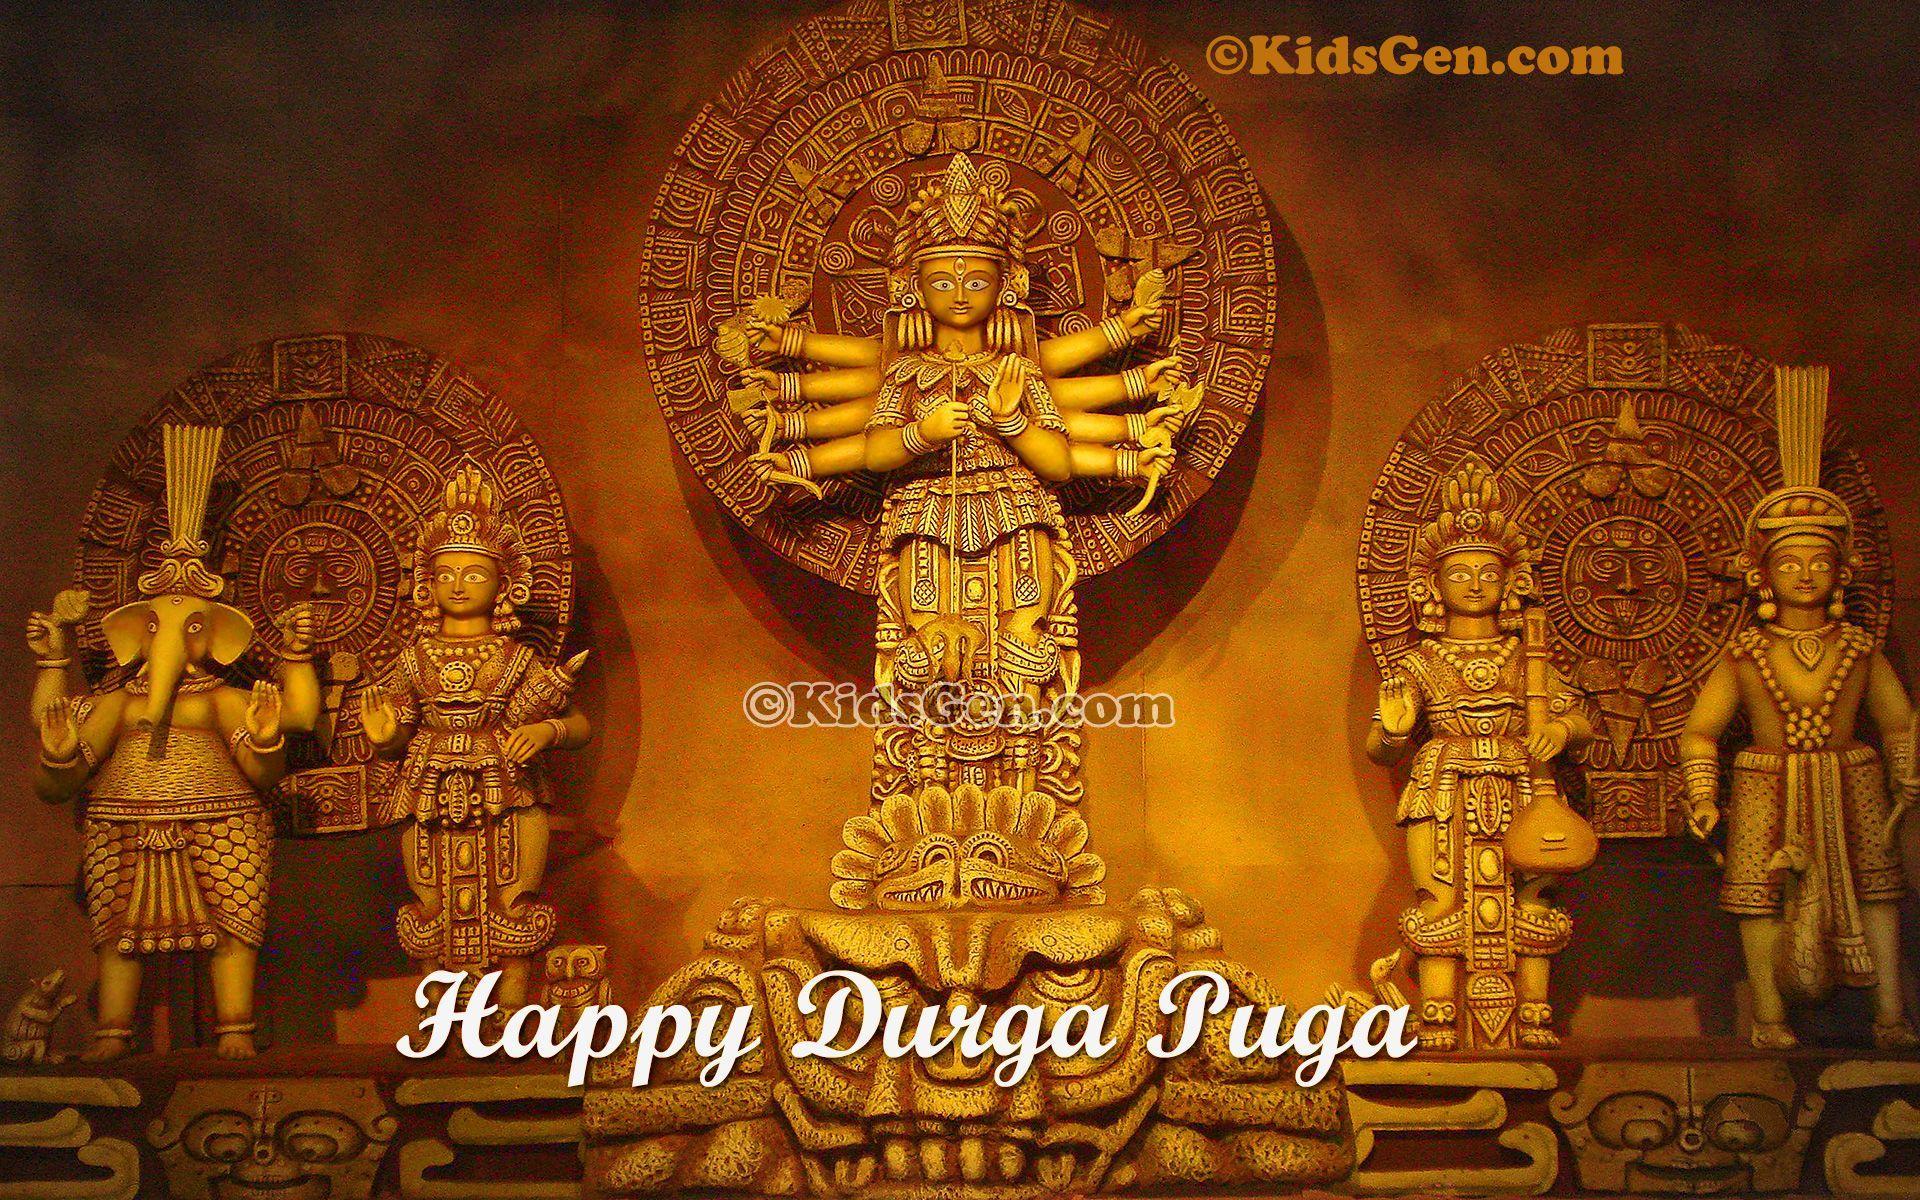 Happy Durga Puja Wallpapers Wallpaper Cave